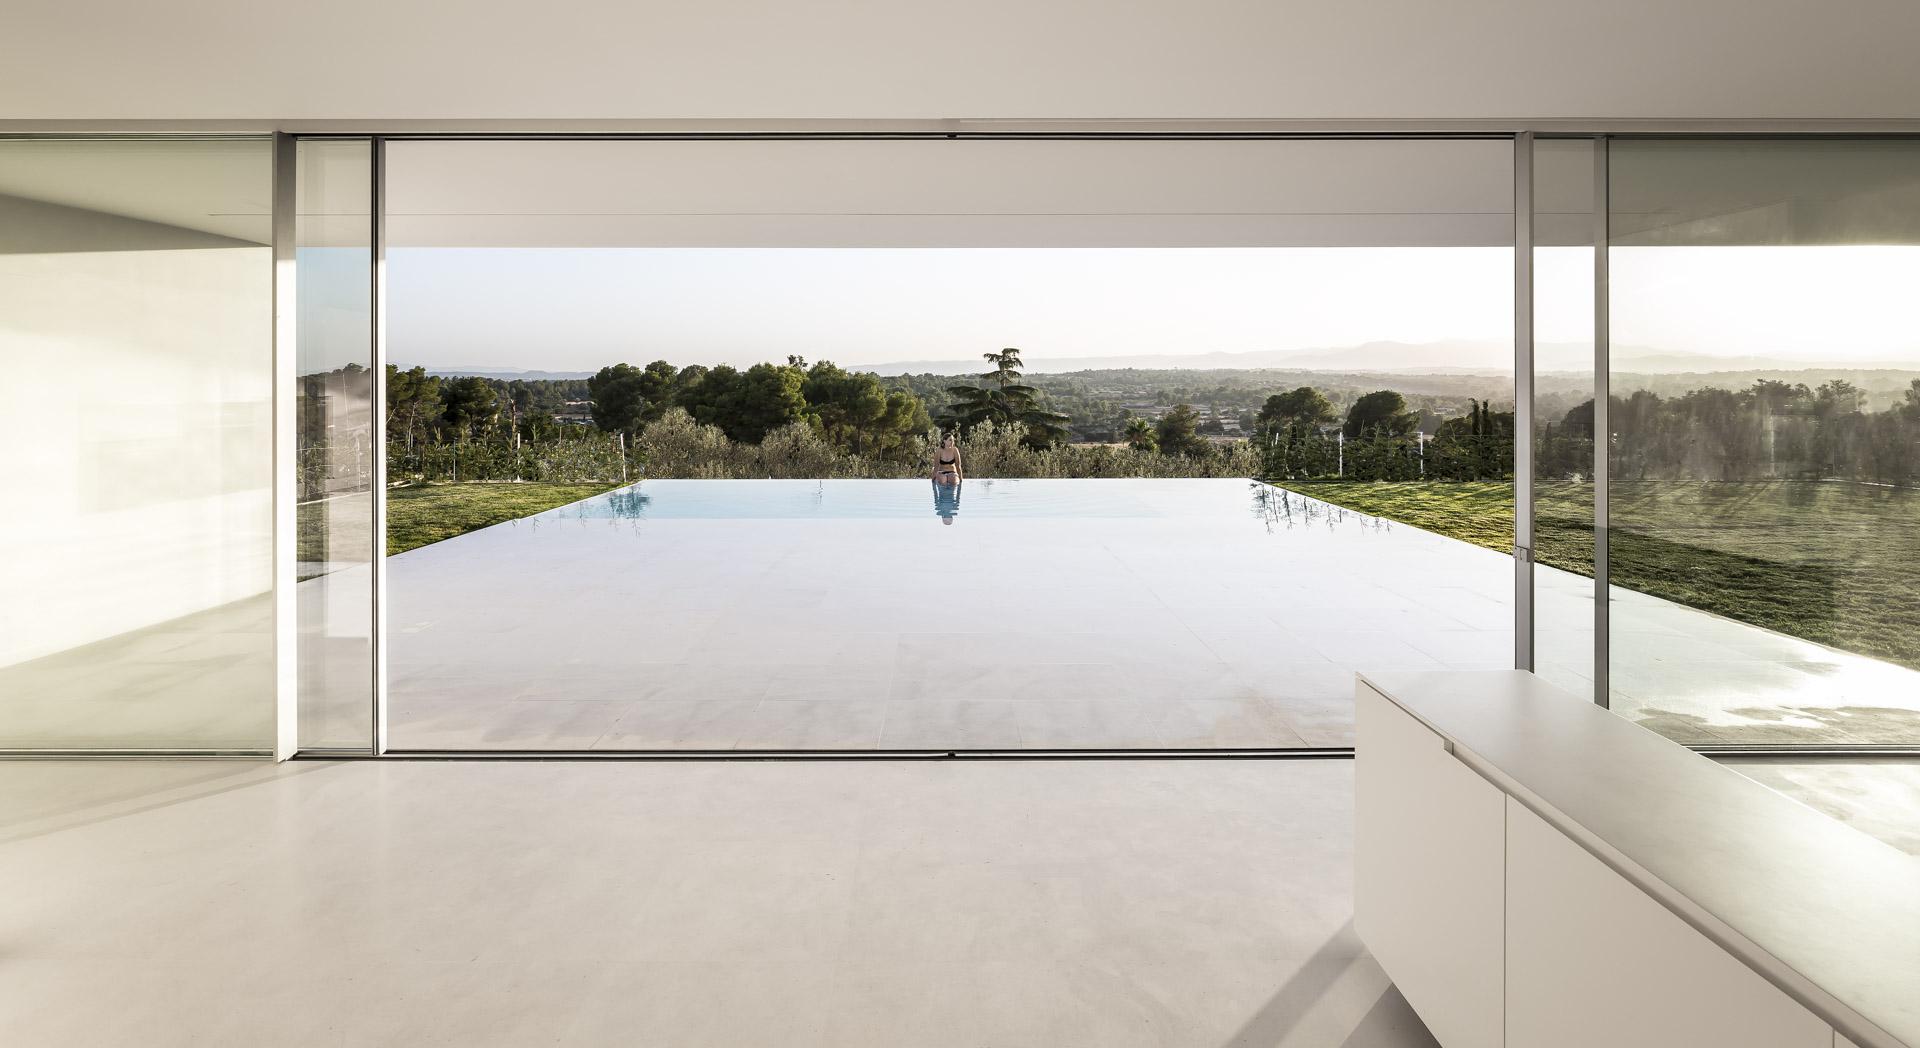 fotografia-arquitectura-valencia-german-cabo-gallardo-llopis-villamarchante-vivienda-51